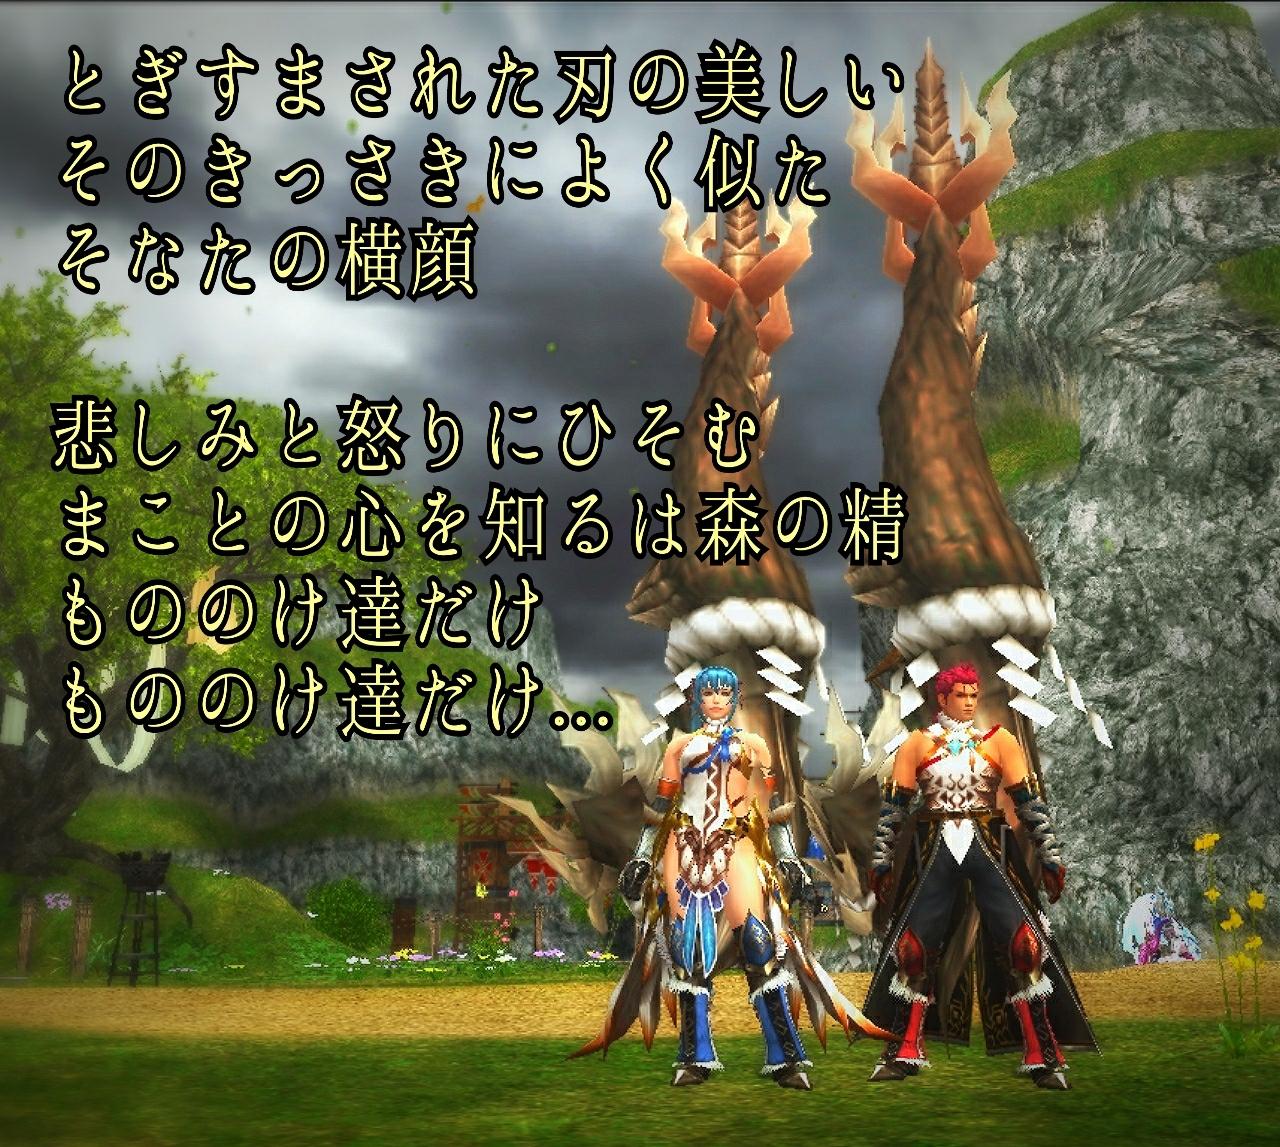 17-02-12-10-00-44-466_deco.jpg